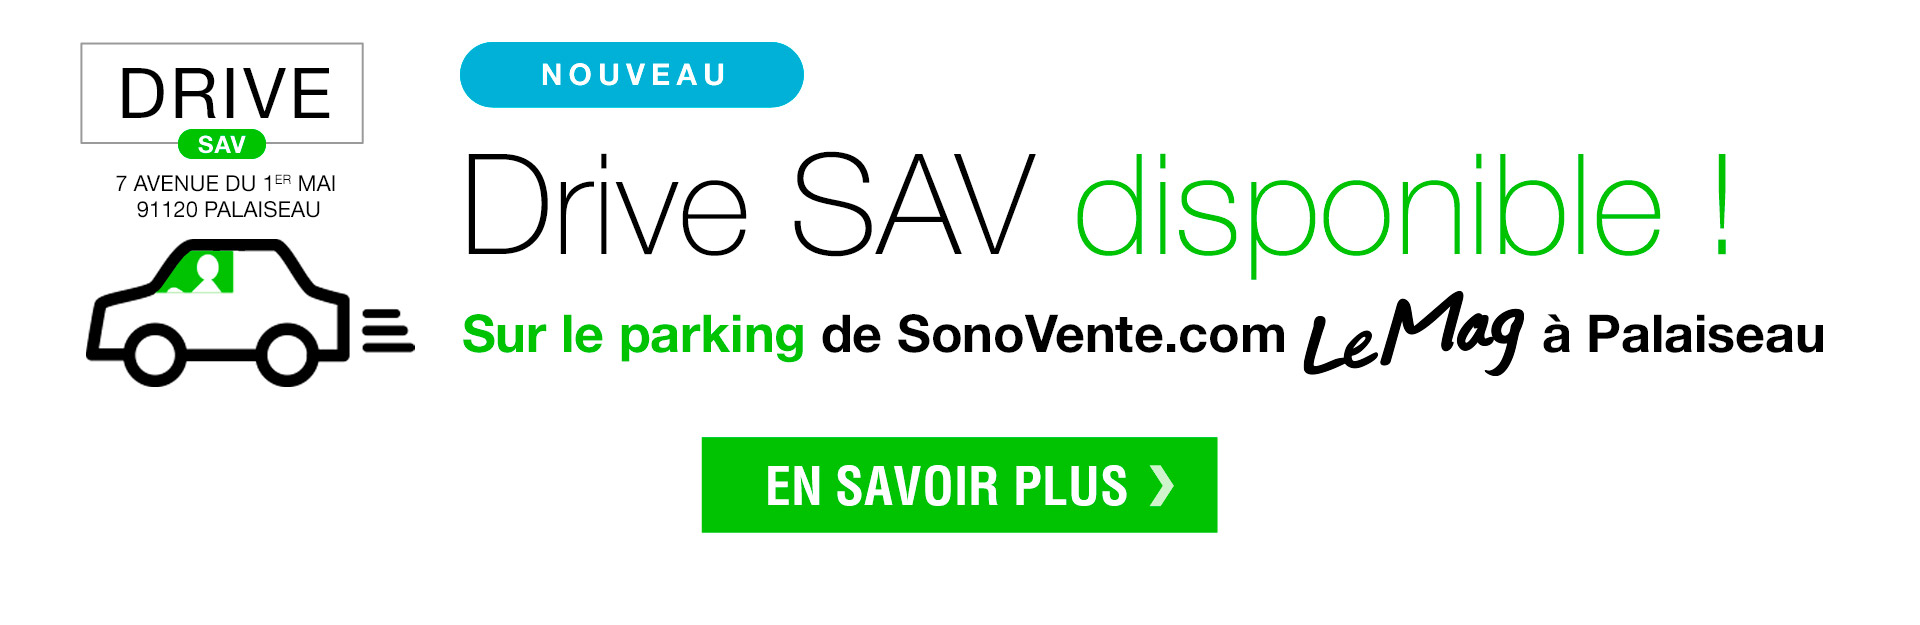 DRIVE SAV